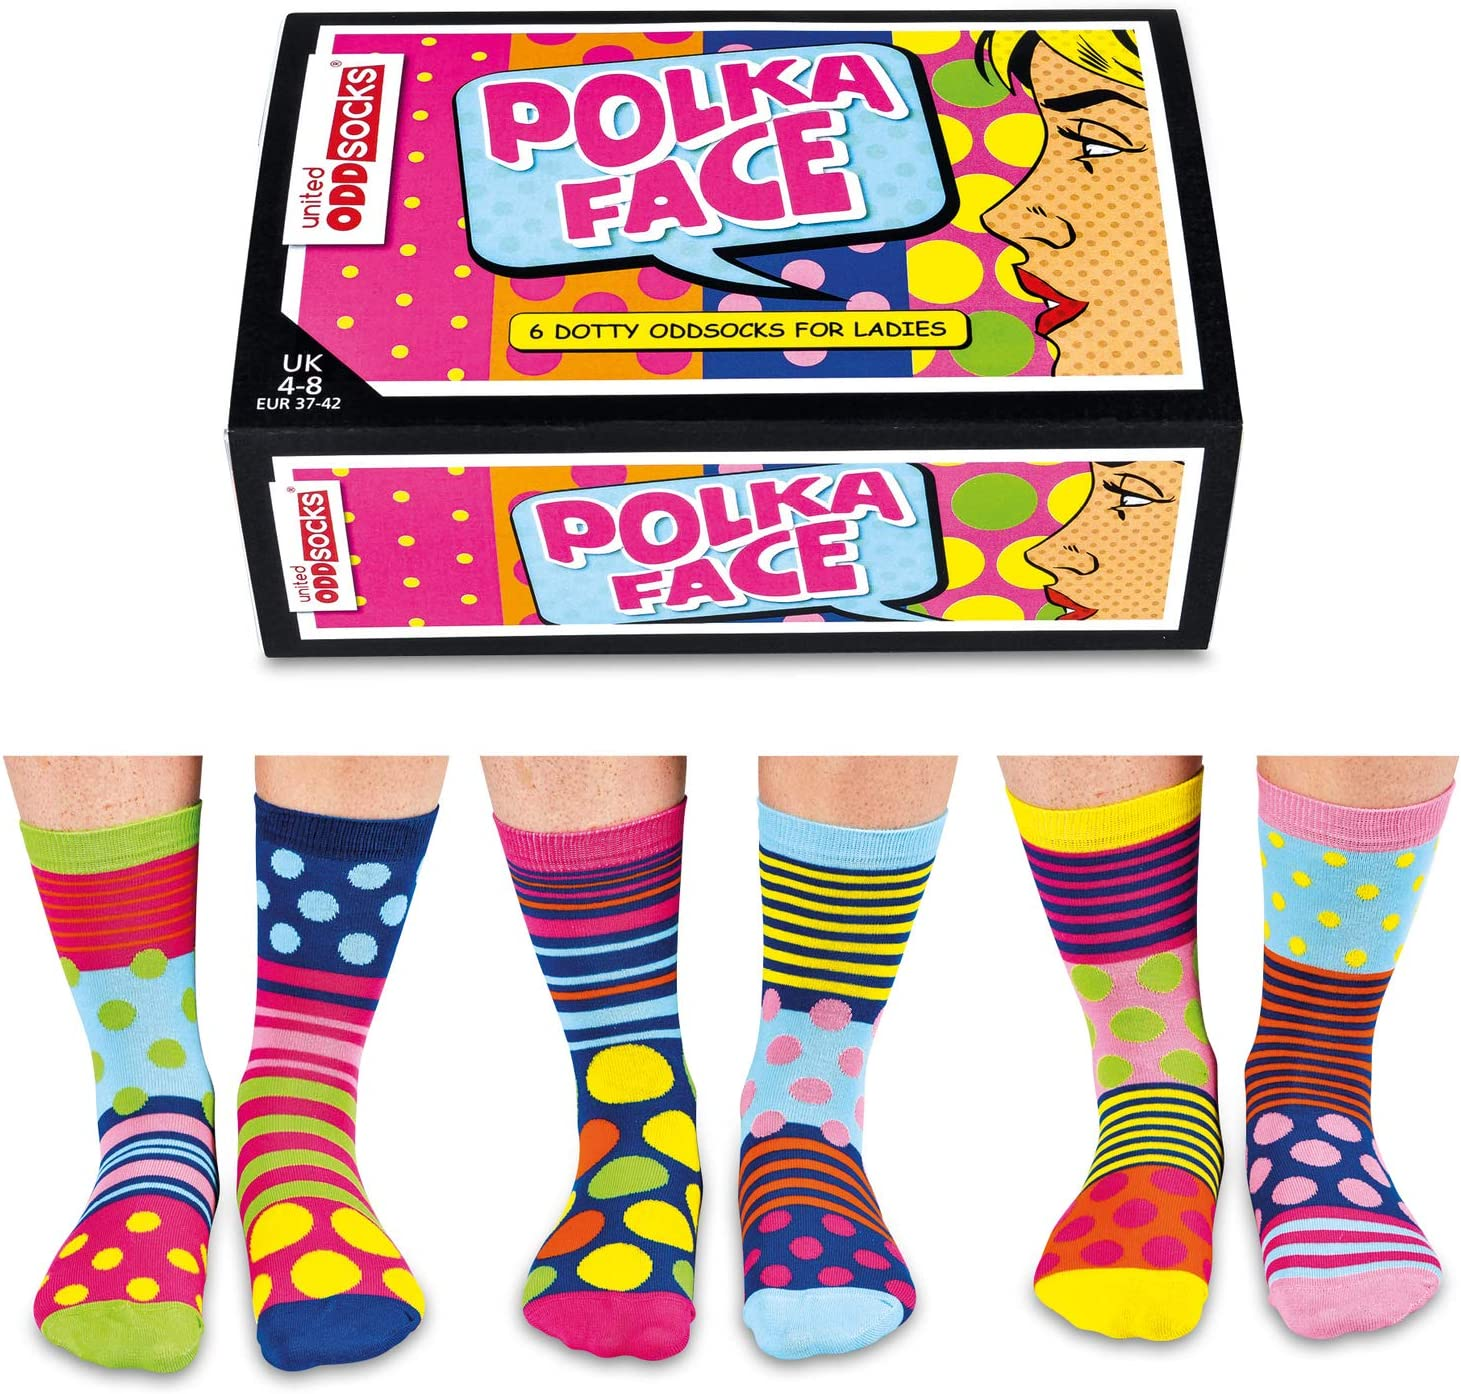 United Oddsocks Be A Unicorn Women UK Size 4-8 Six 6 Cute Odd Socks Set Gift